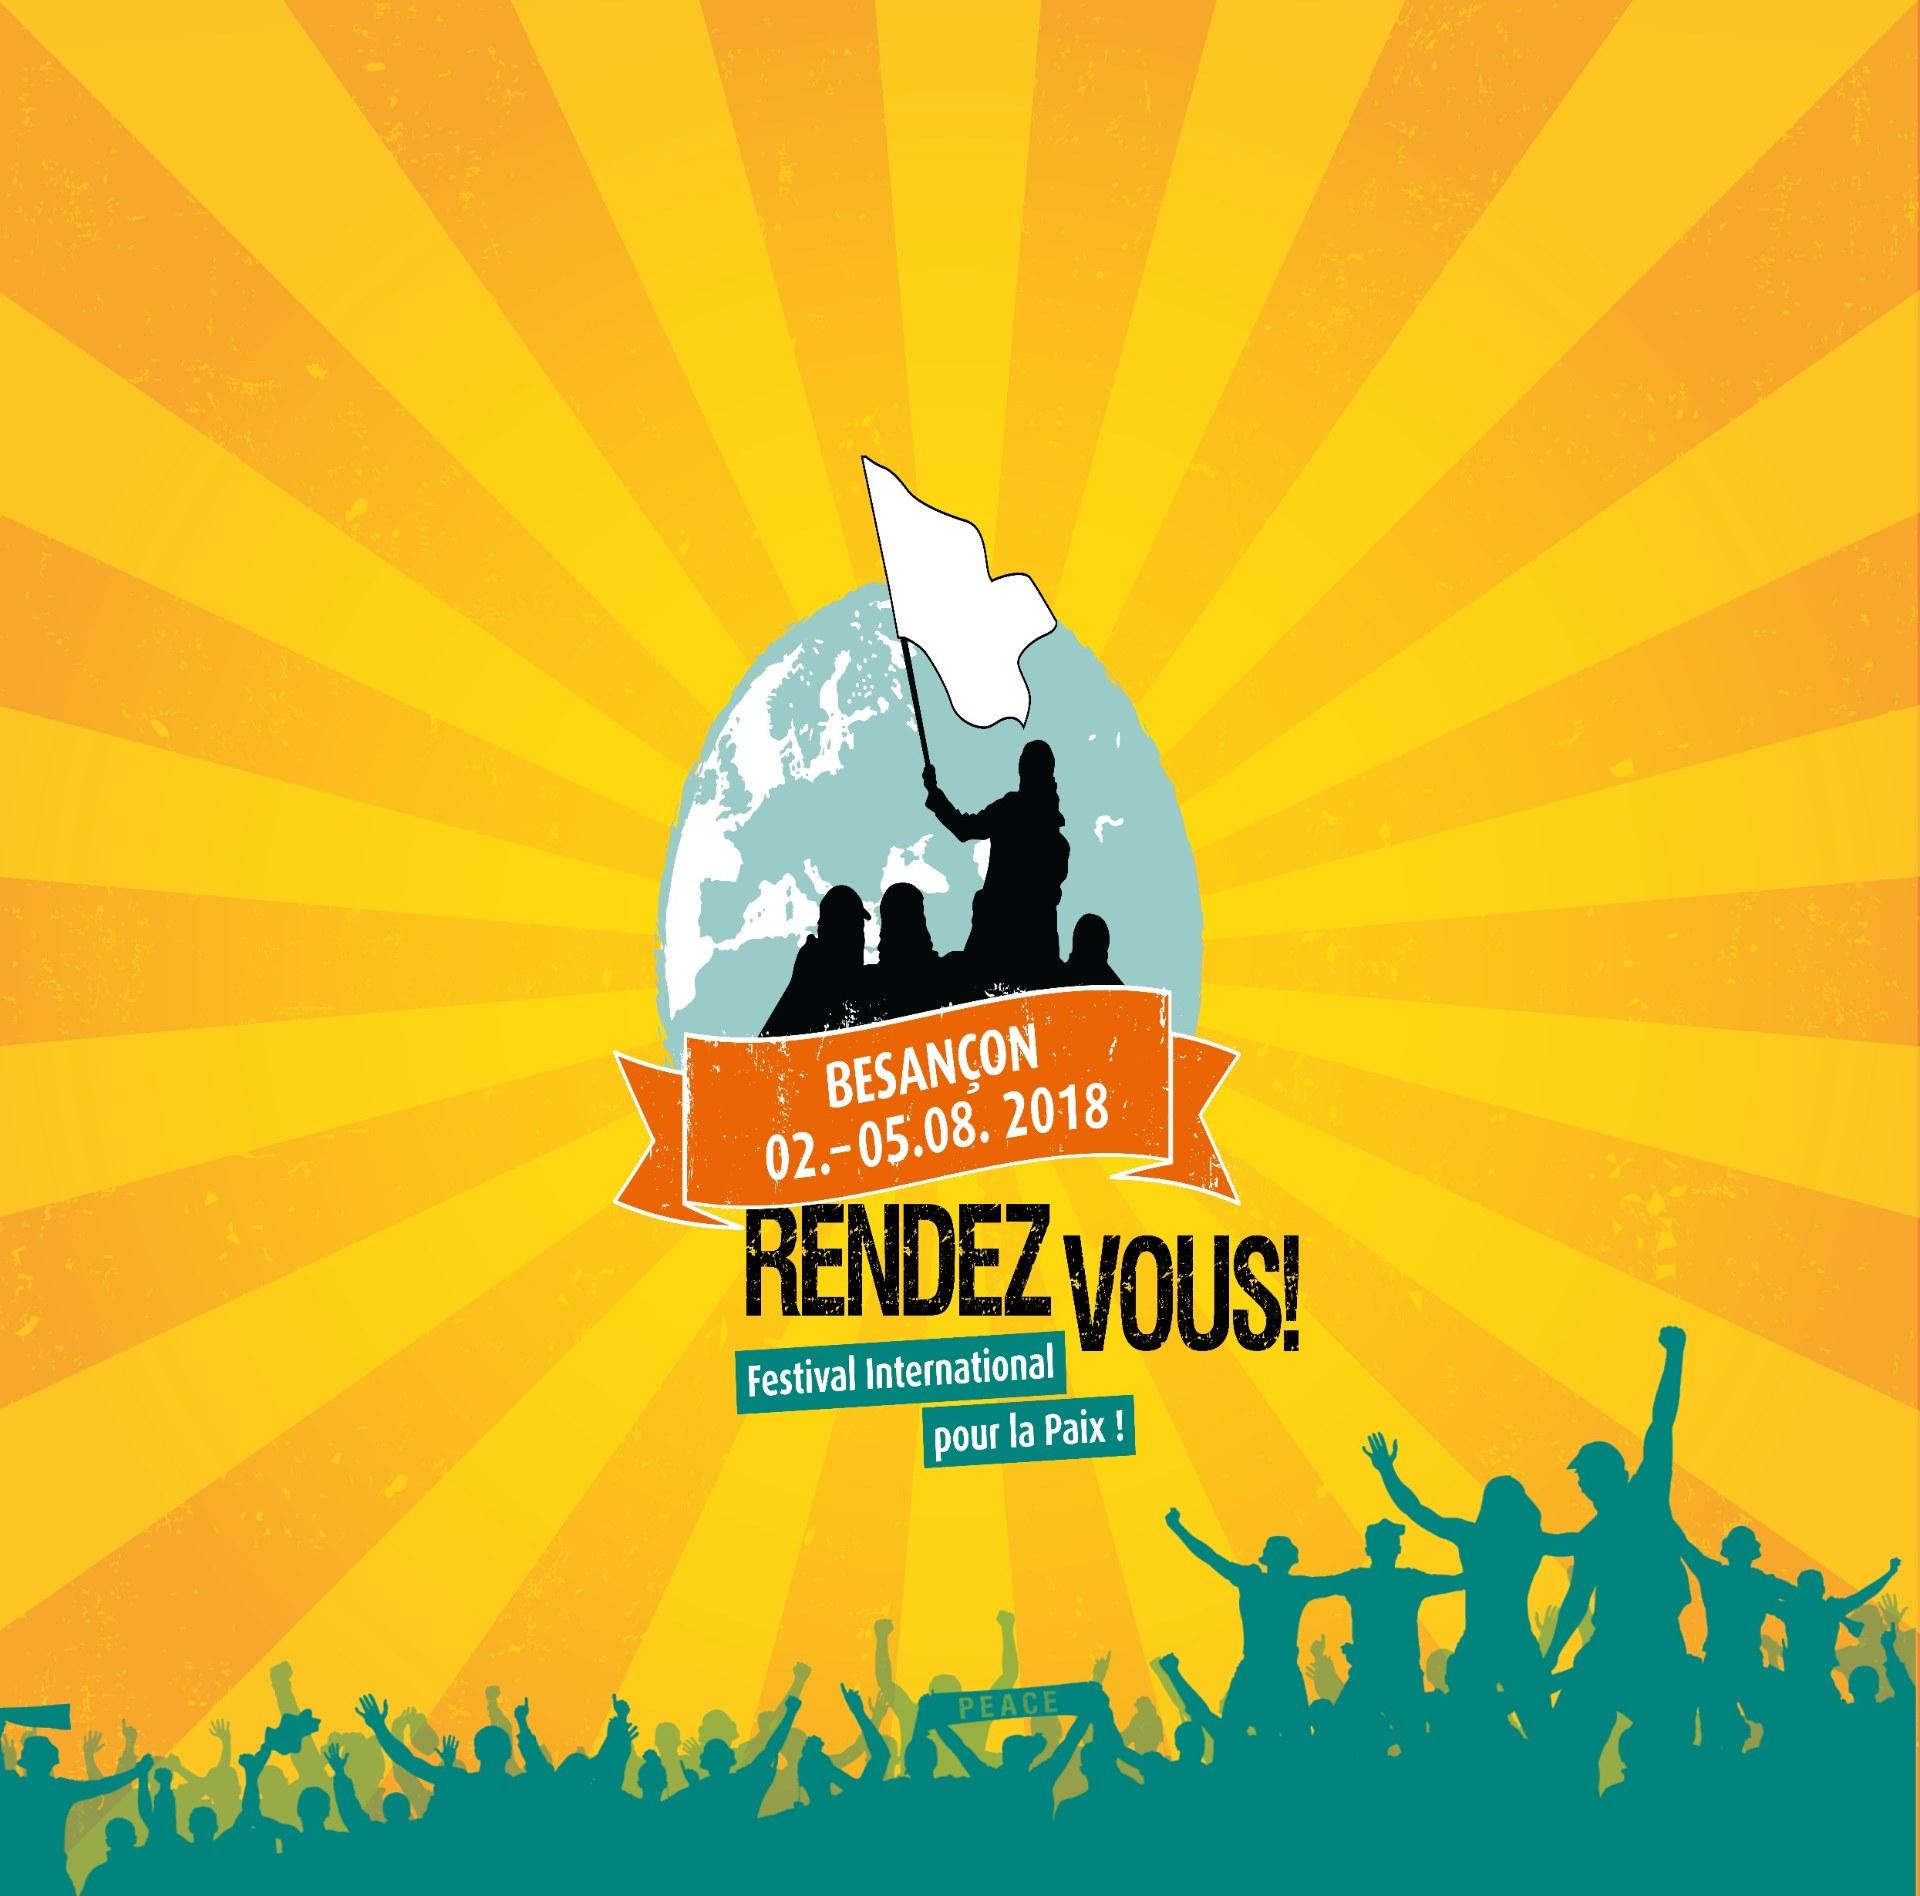 RENDEZVOUS!-background